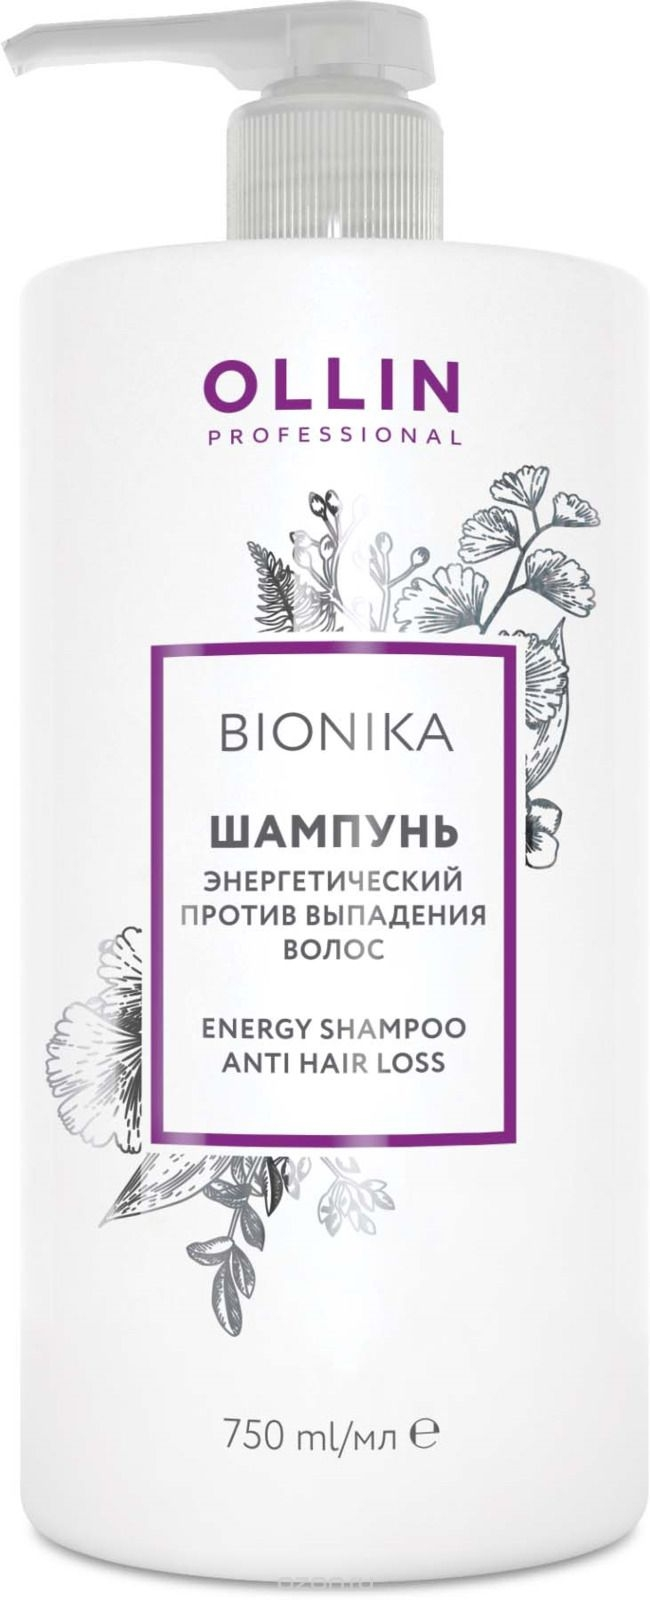 OLLIN PROFESSIONAL BioNika Шампунь Энергетический Против Выпадения Волос Energy Shampoo Anti Hair Loss, 750 мл недорого